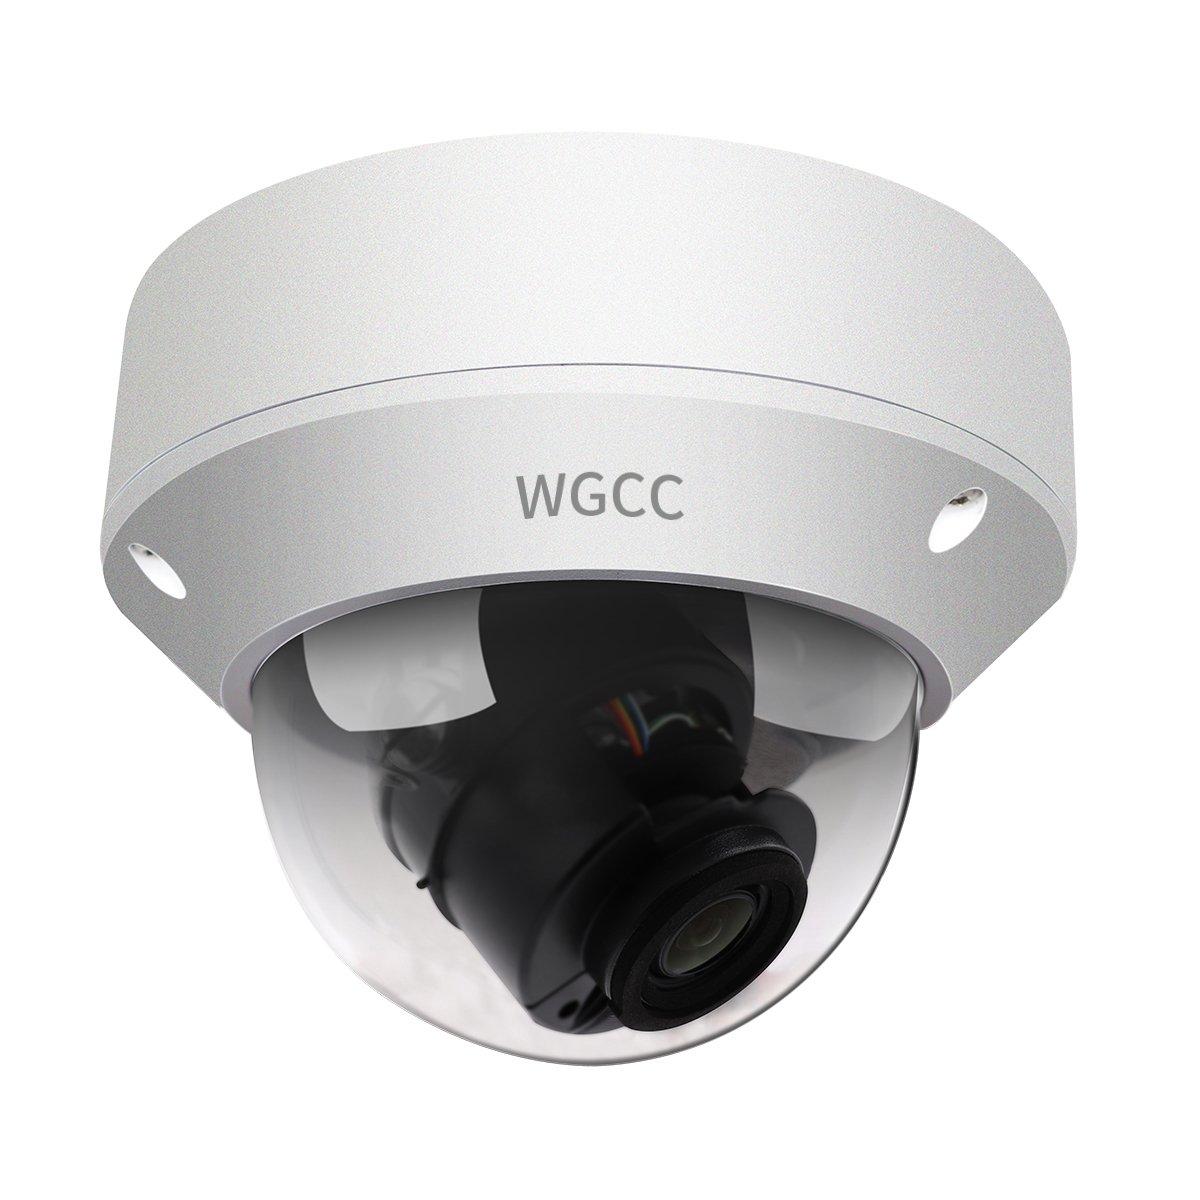 WGCC 4 Megapixel Vari-focal WDR Zoom Dome IP Network Camera, IP67 weatherproof three-year quality assurance (2.8~12mm)